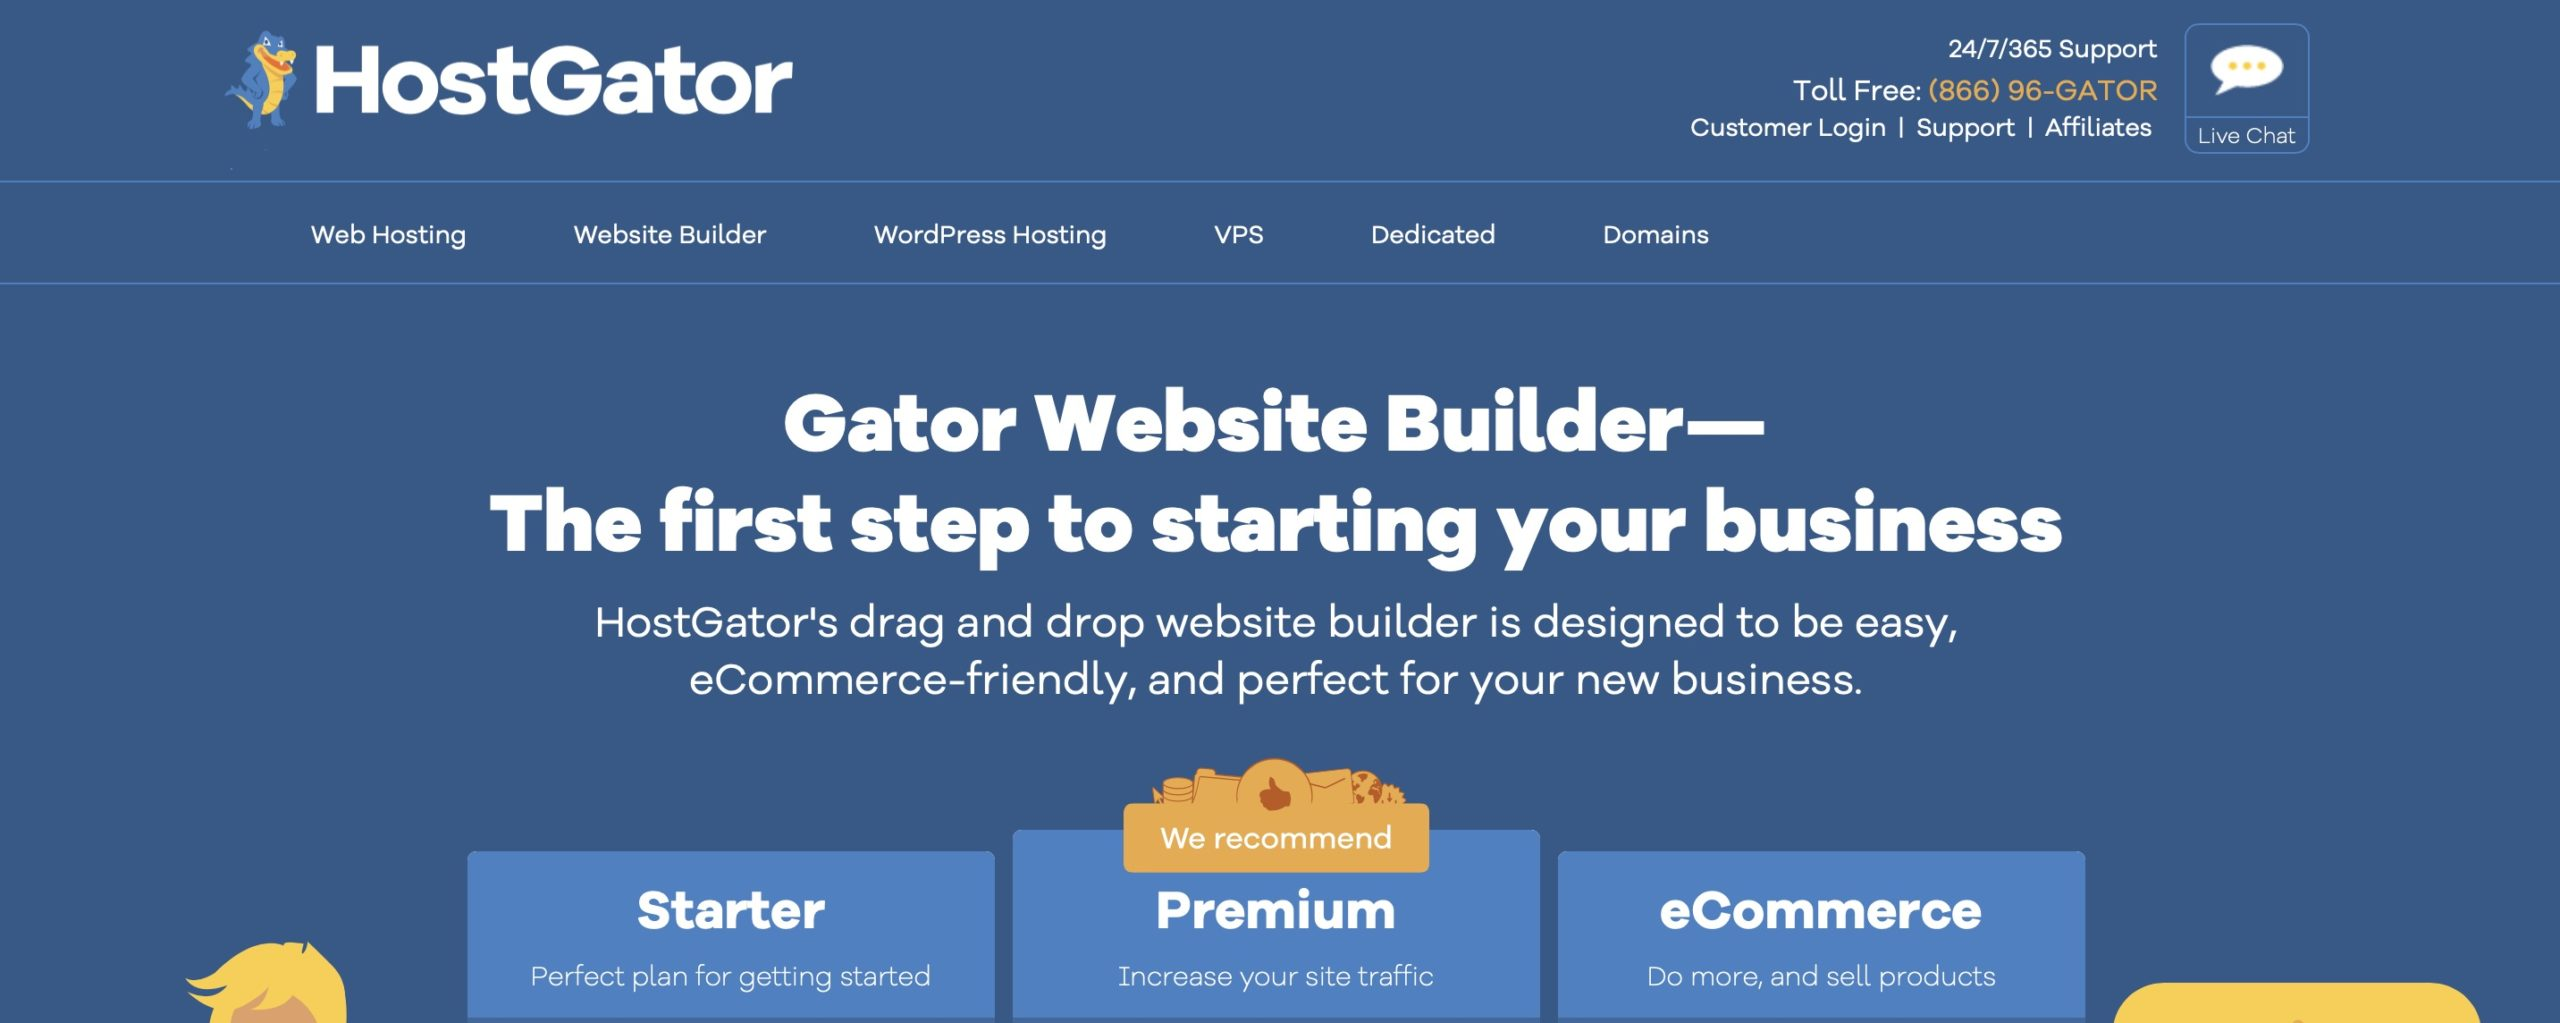 HostGator website builder homepage screenshot